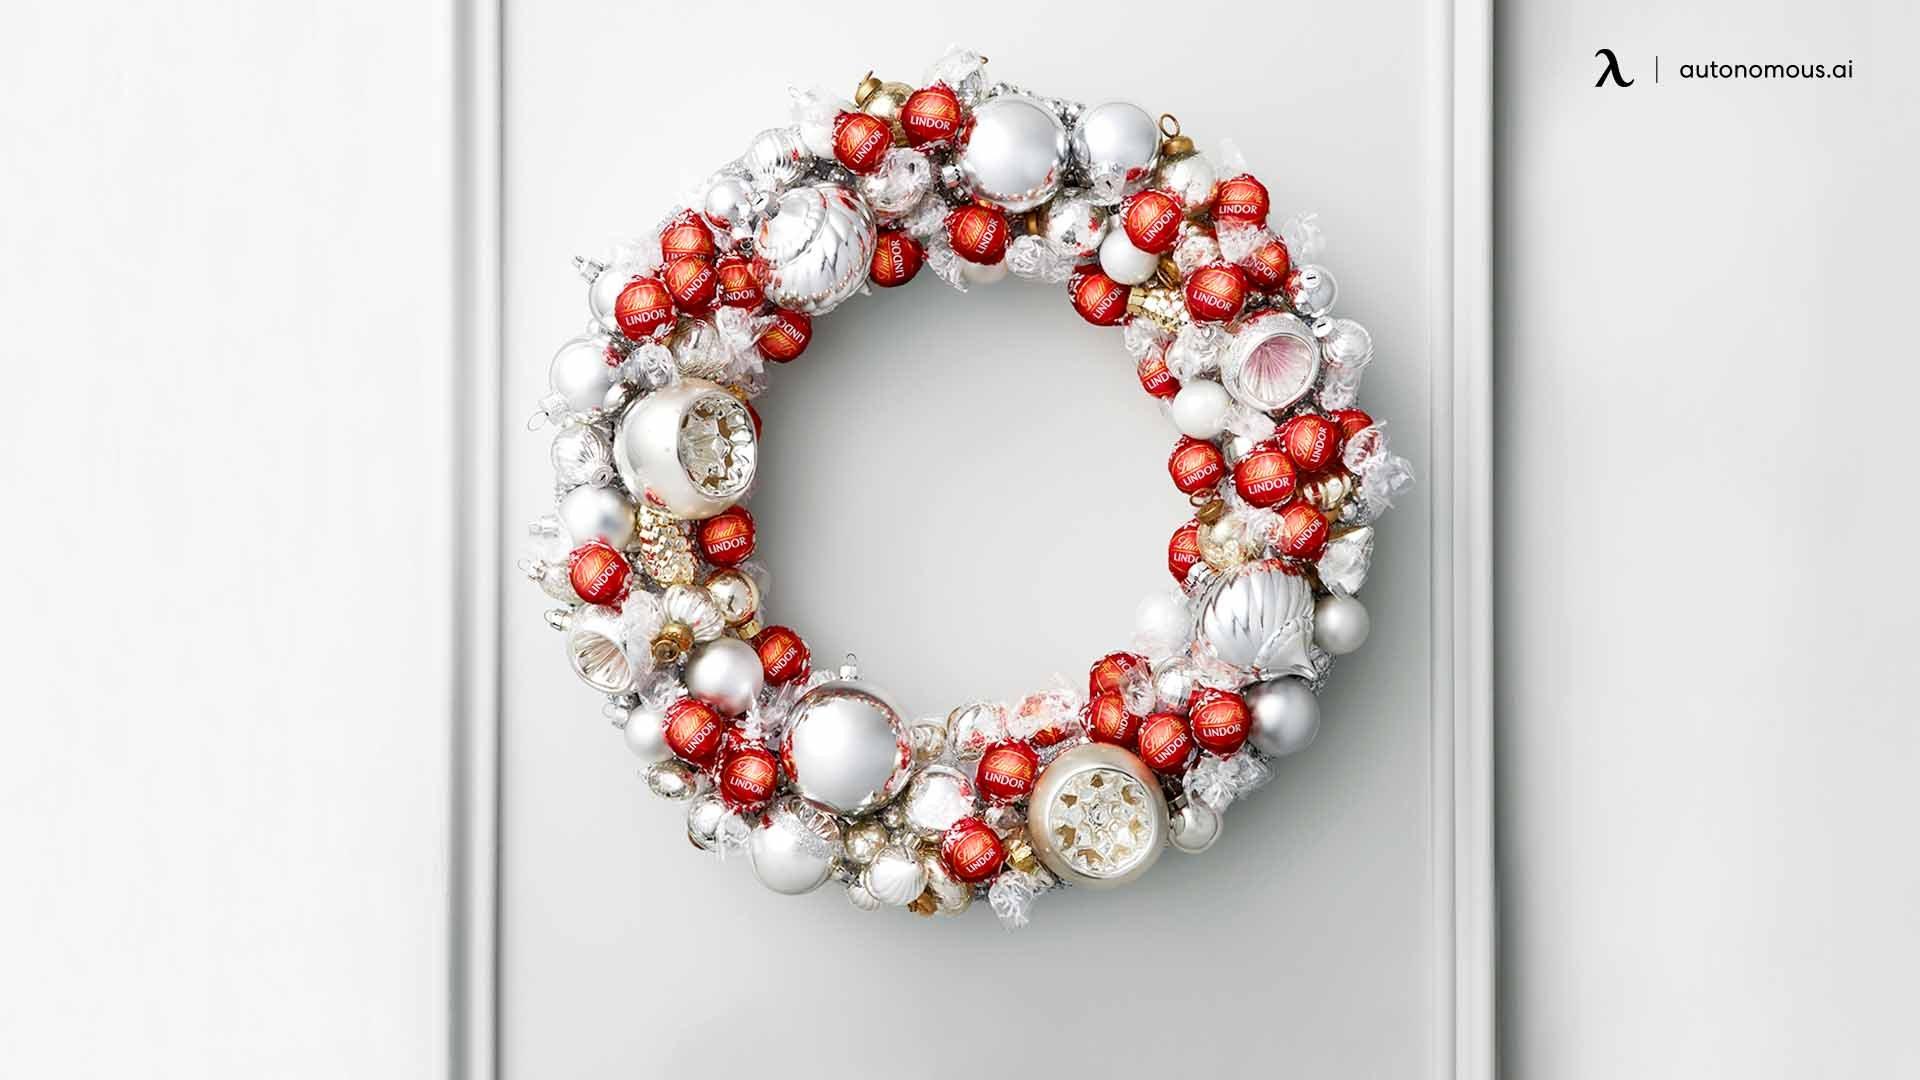 Chocolate Holiday Wreath